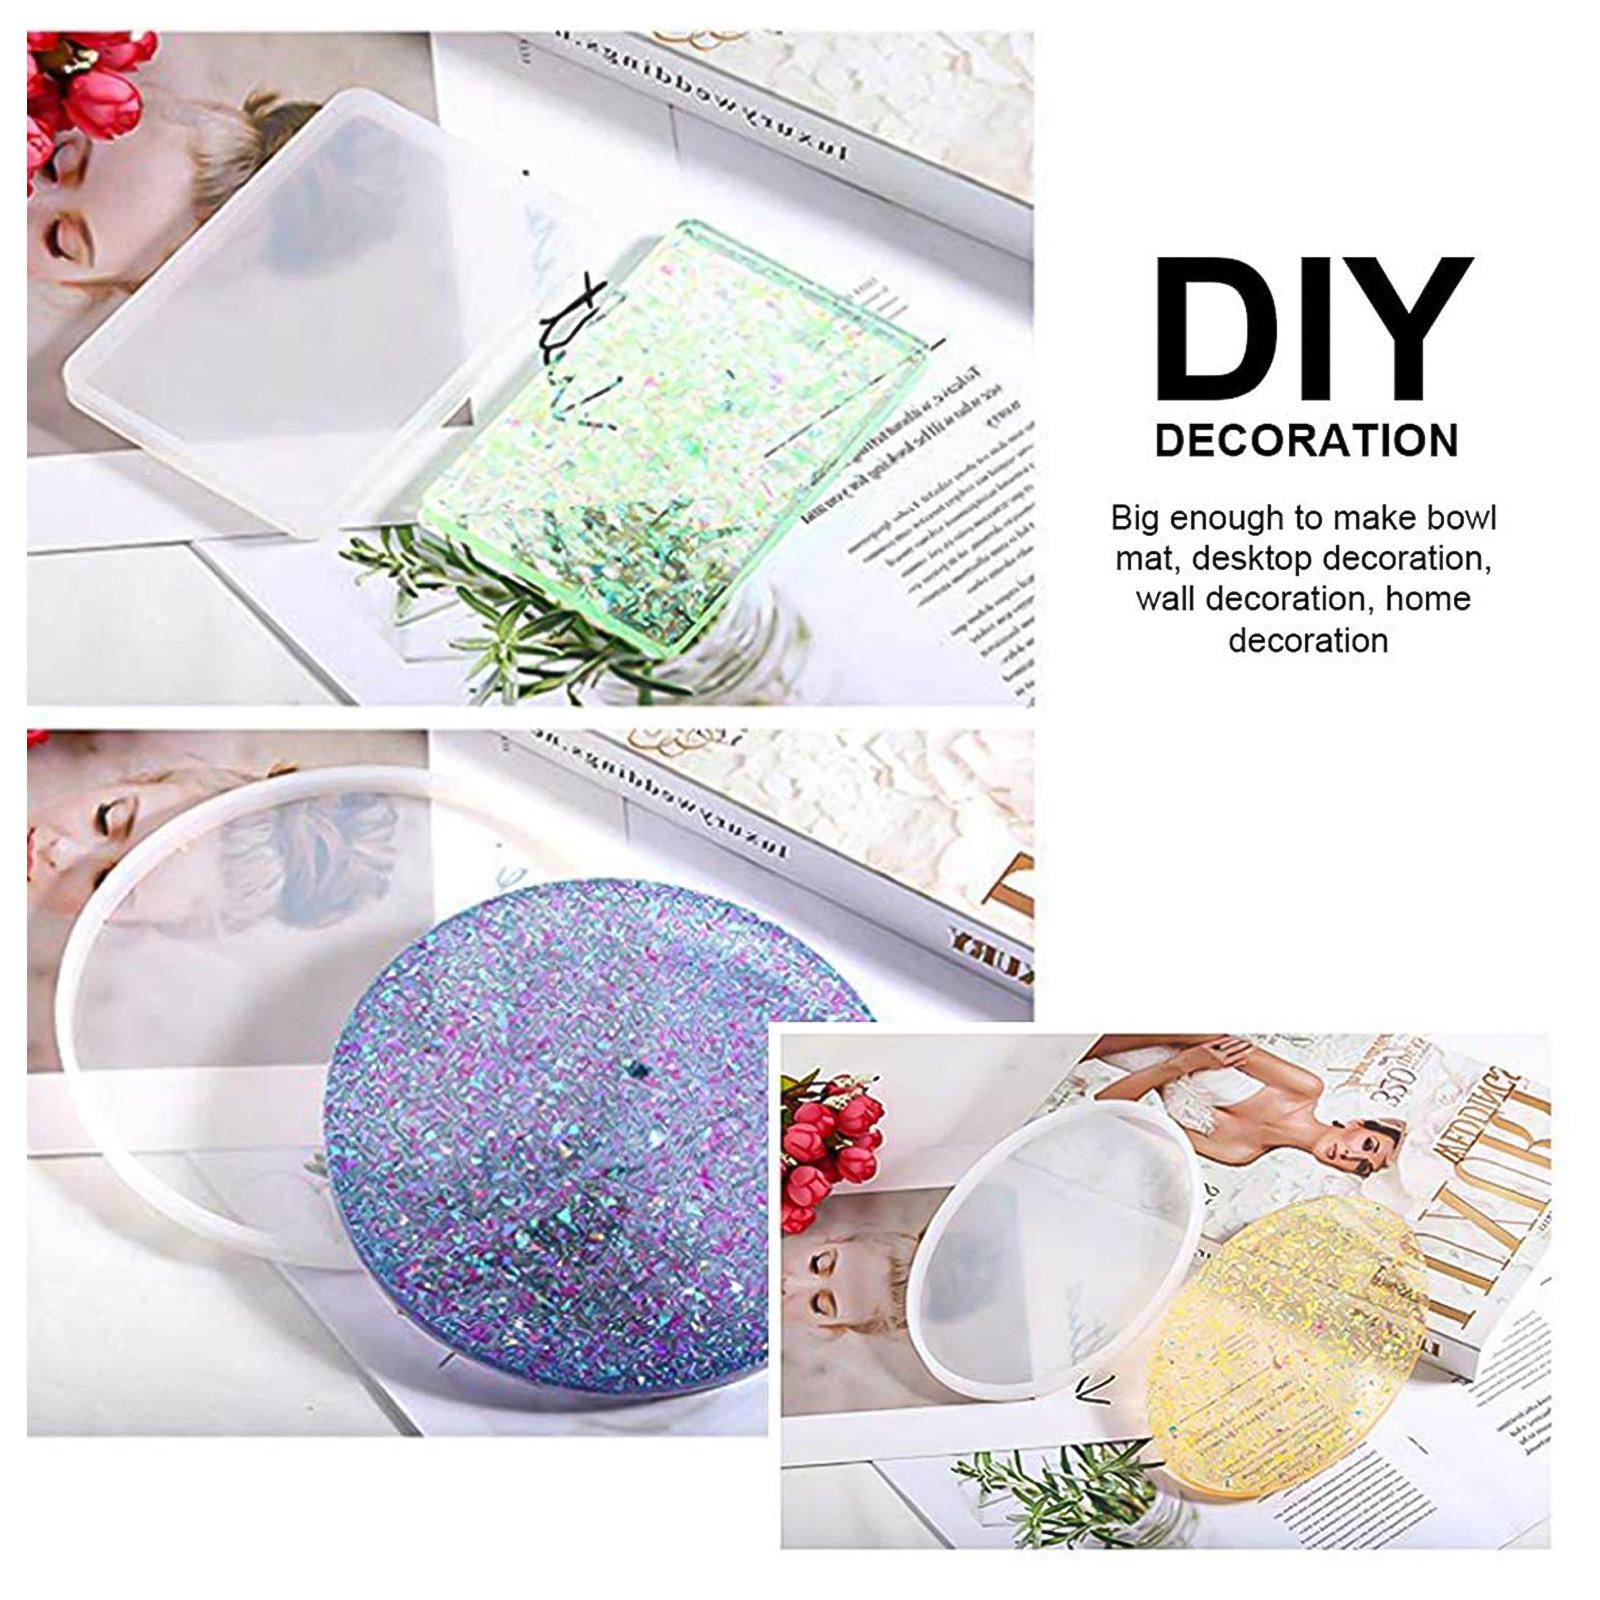 Silicone-Resin-Molds-Epoxy-Casting-Art-Coaster-Ashtray-Bowl-Mat-DIY-Craft-Tool thumbnail 3